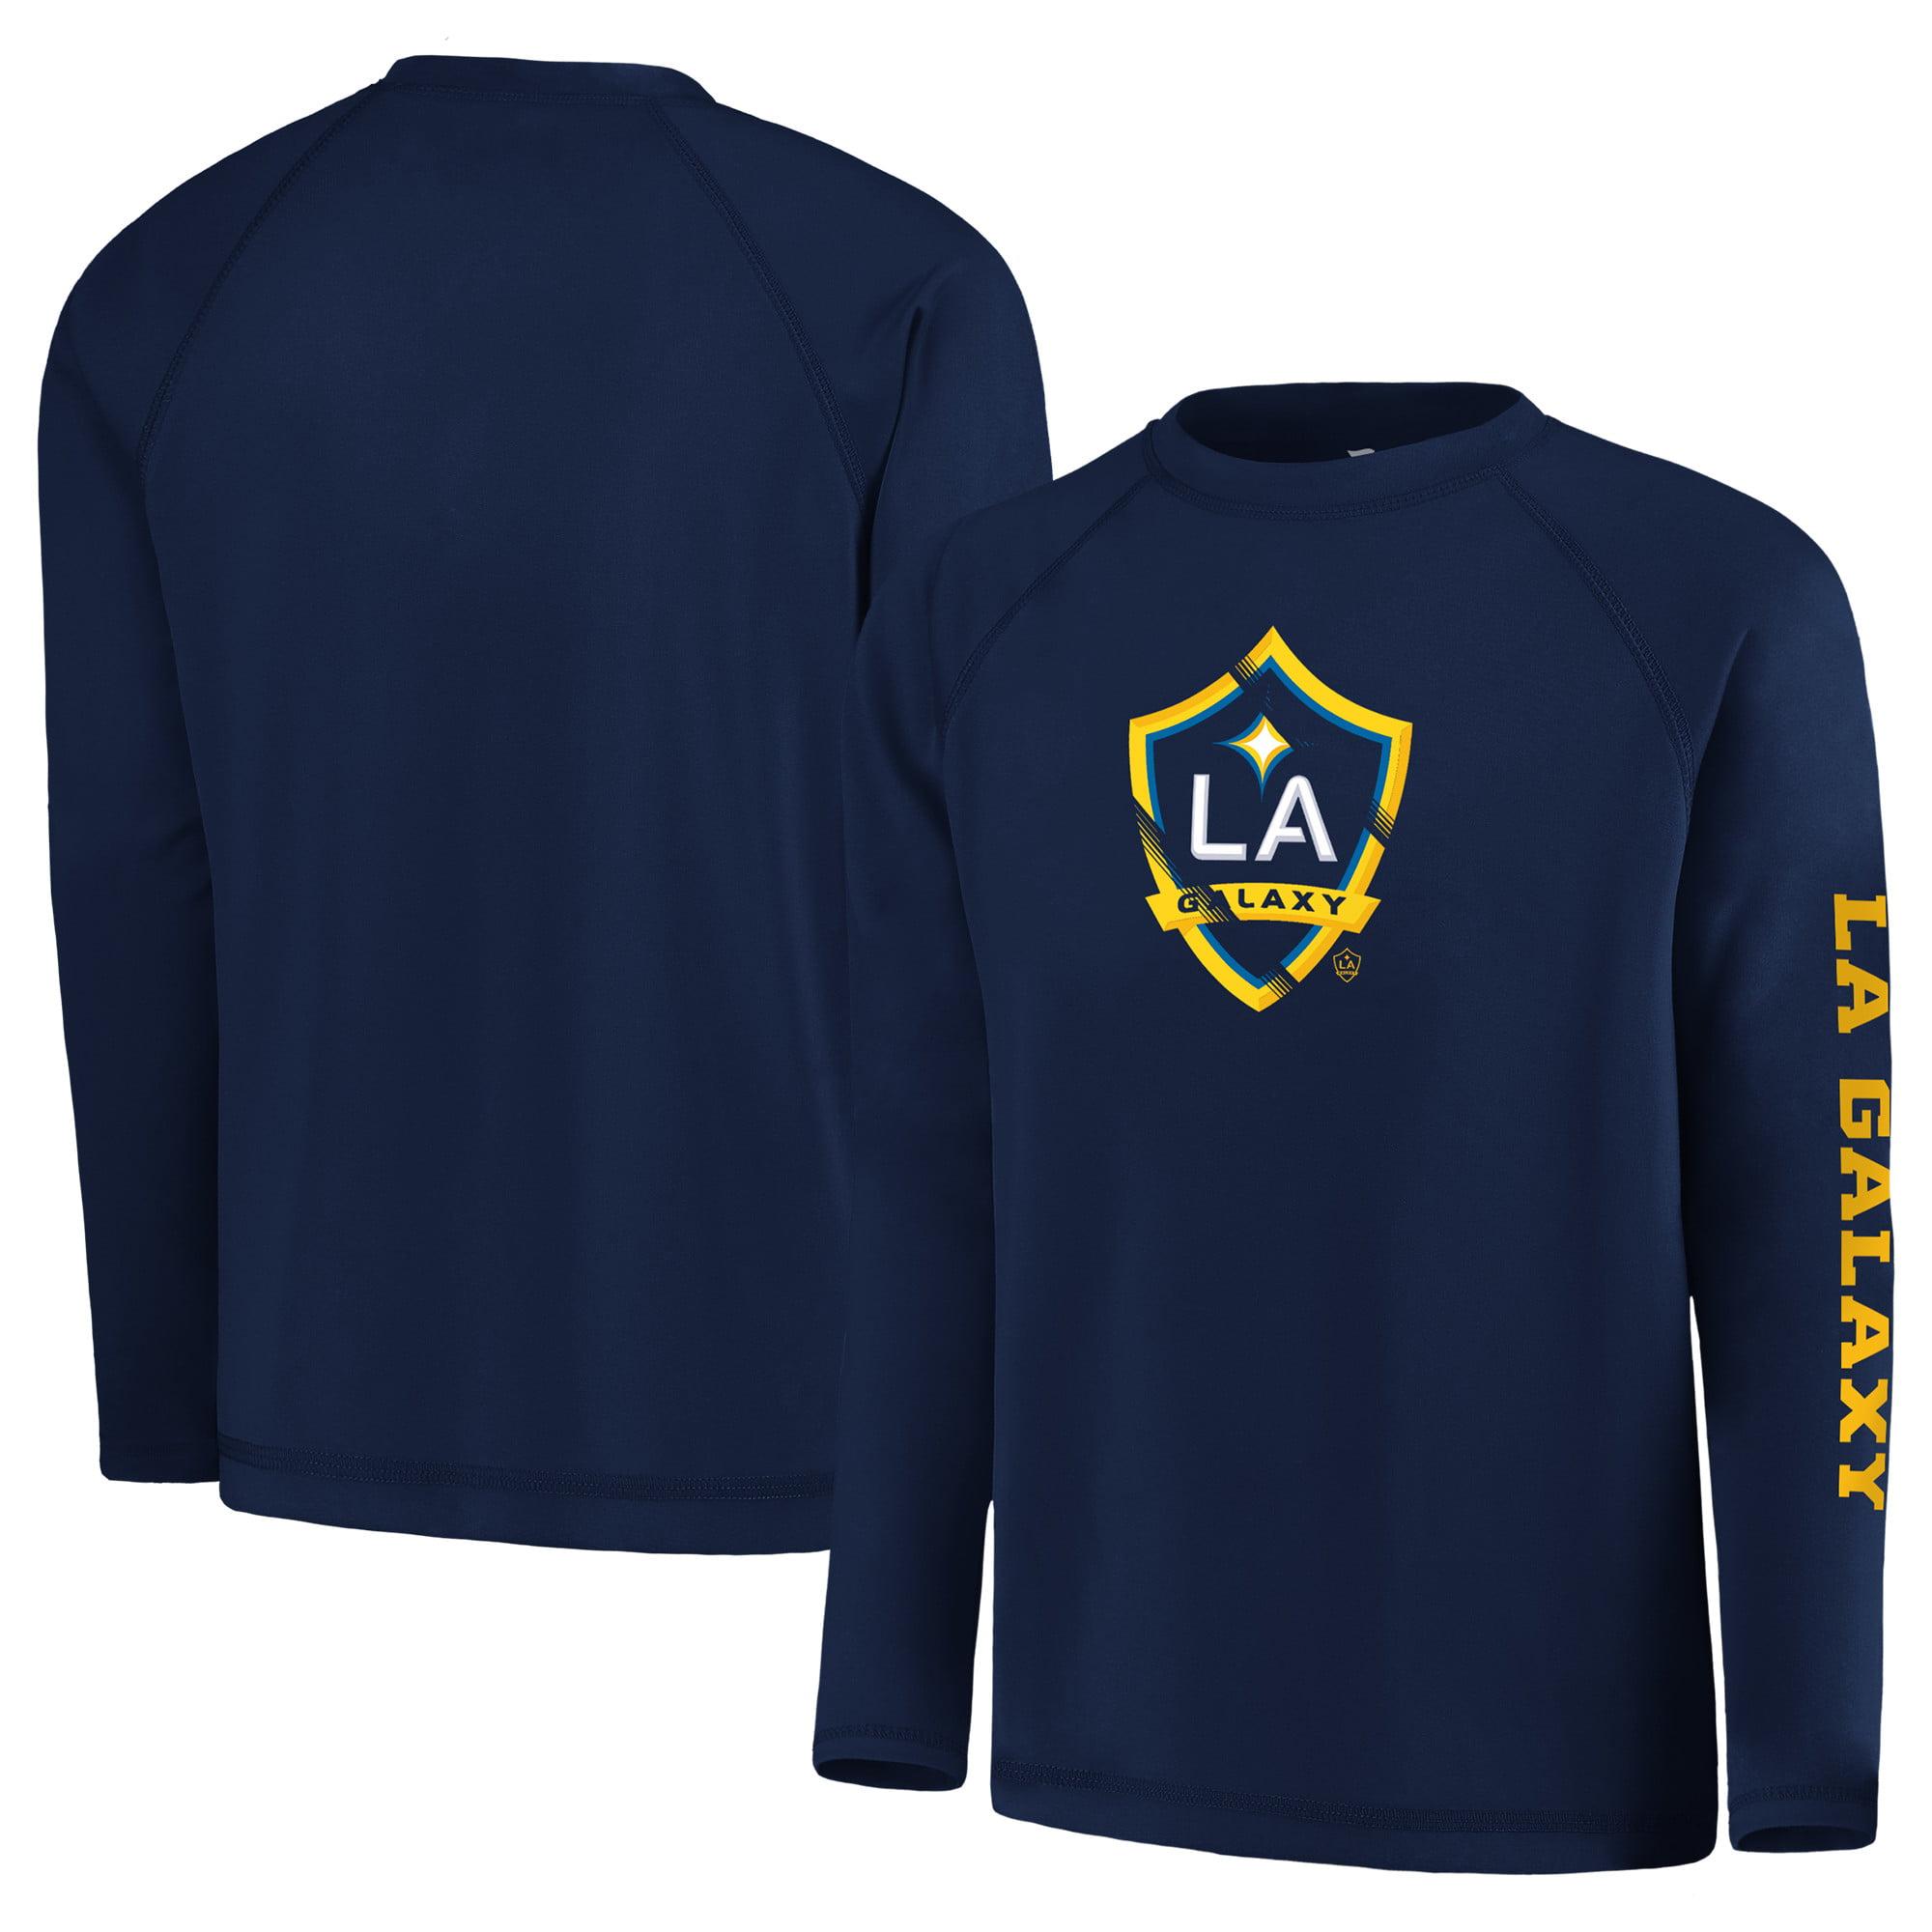 LA Galaxy Fanatics Branded Youth Vital to Success Long Sleeve T-Shirt - Navy